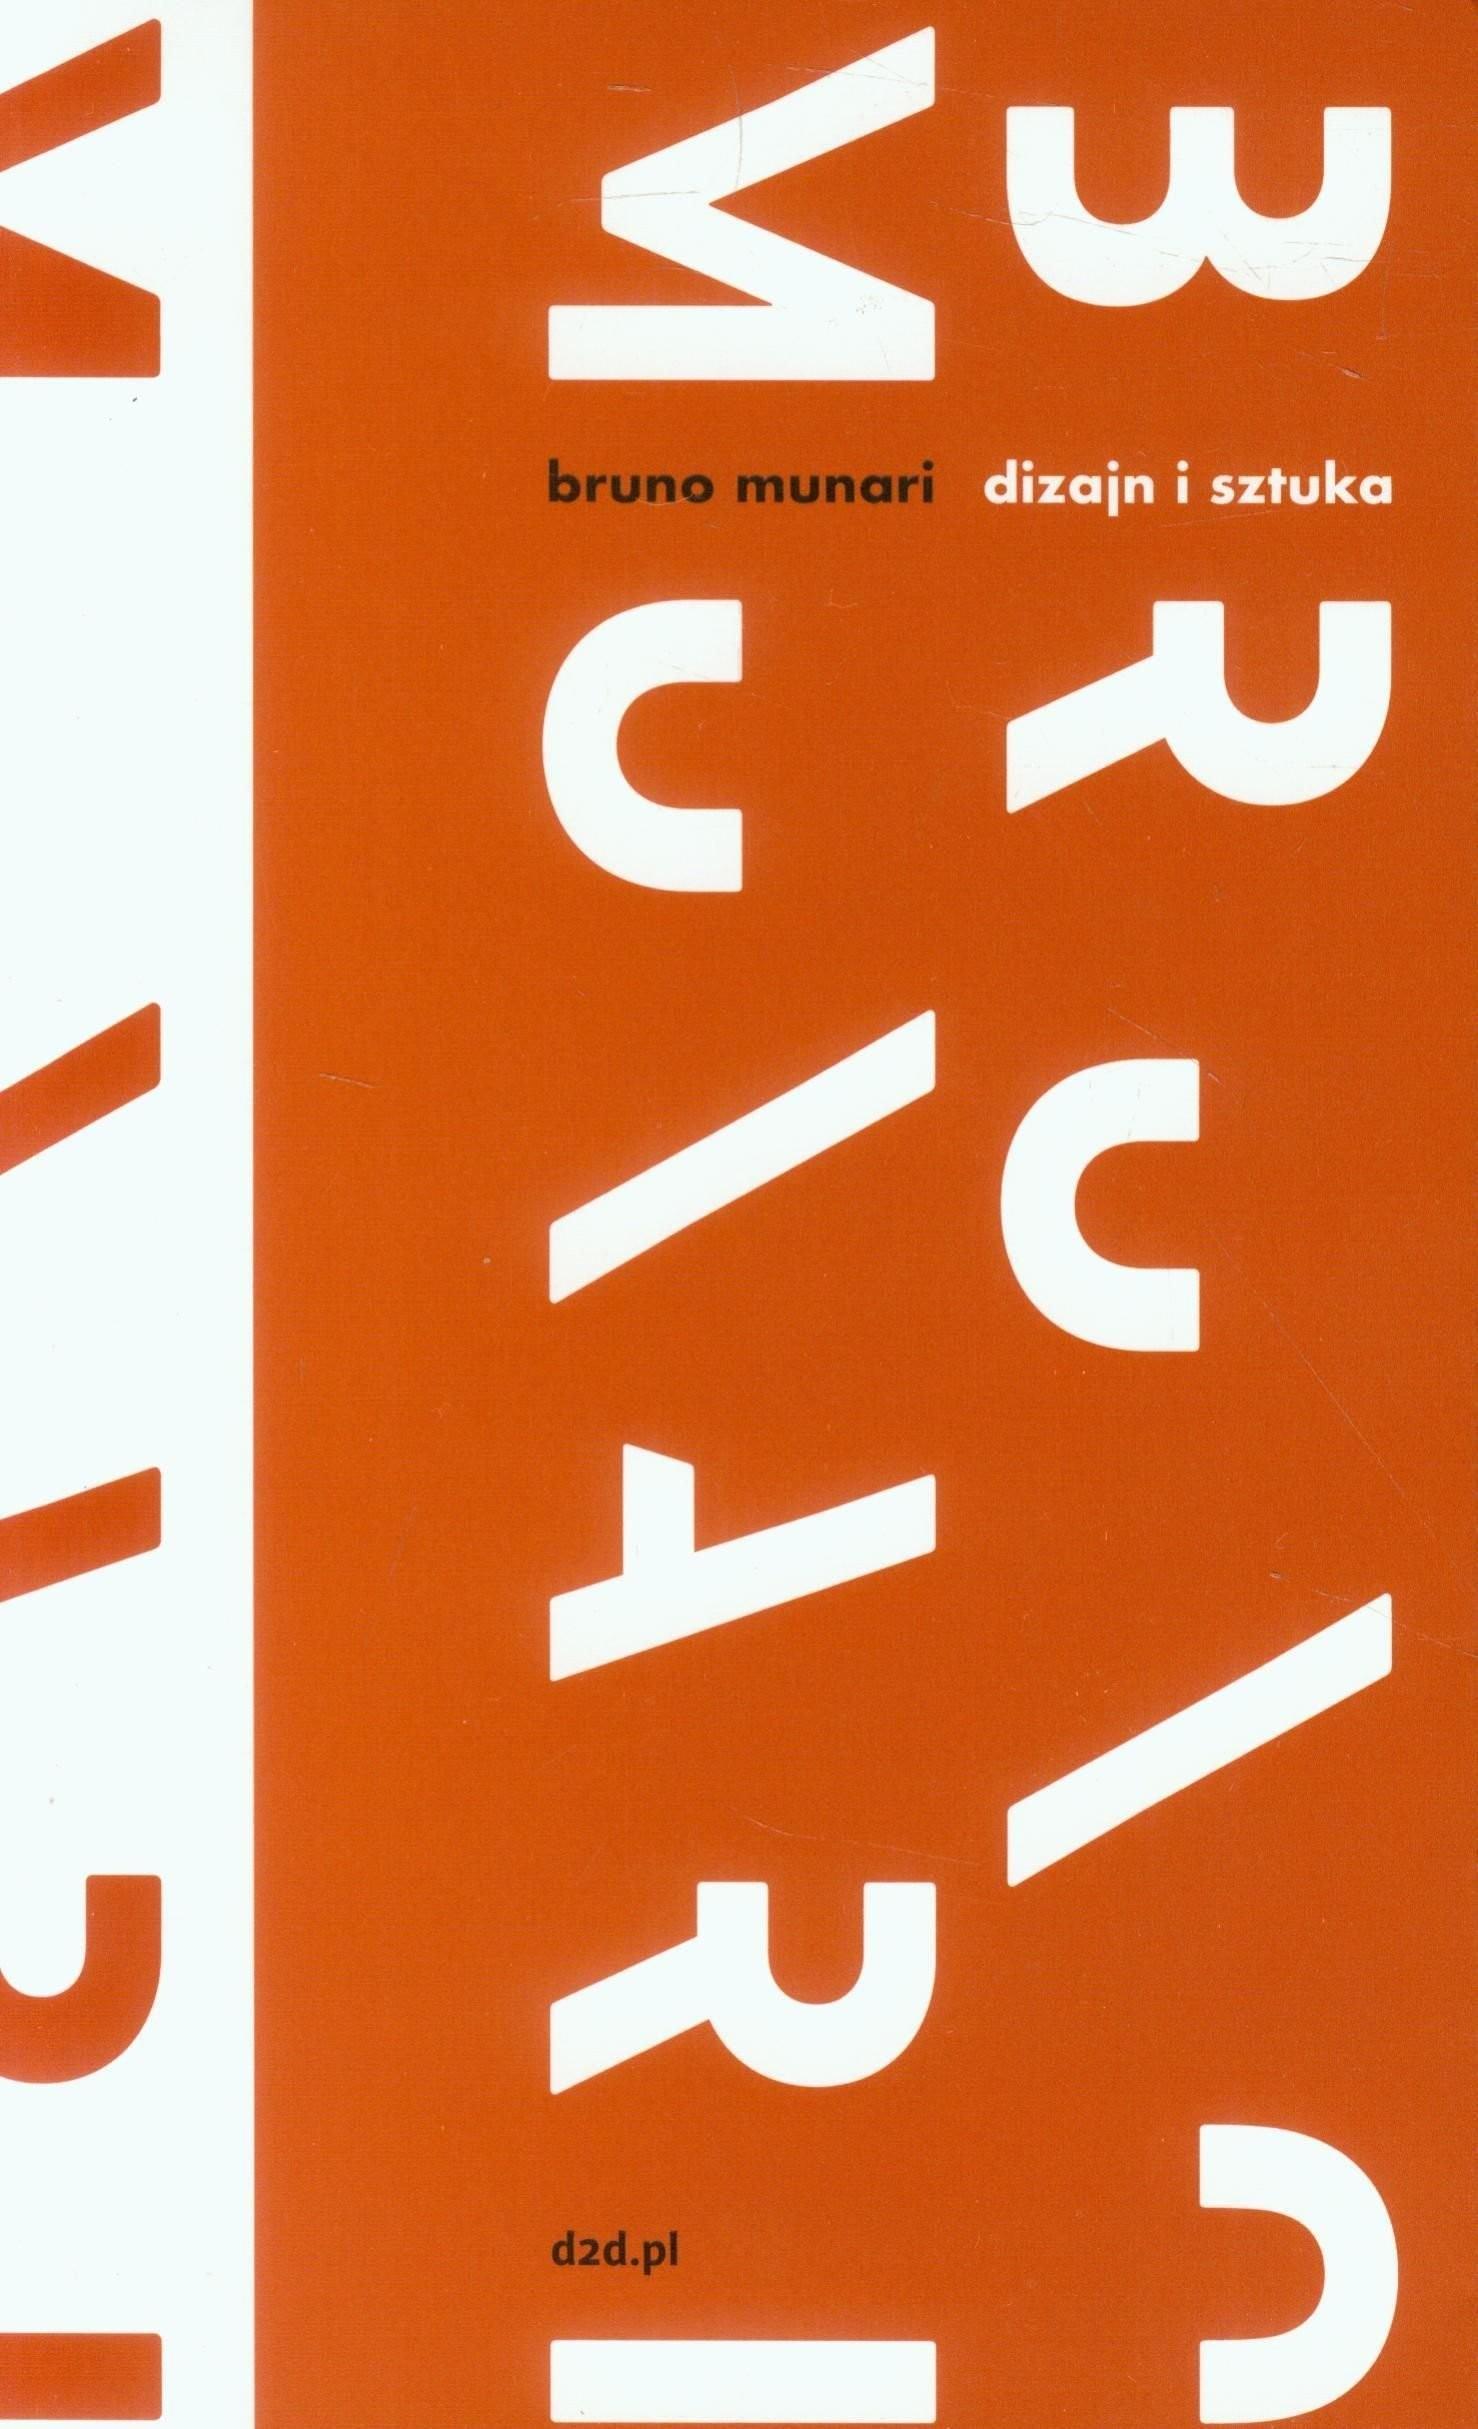 d2d Dizajn i sztuka - Bruno Munari